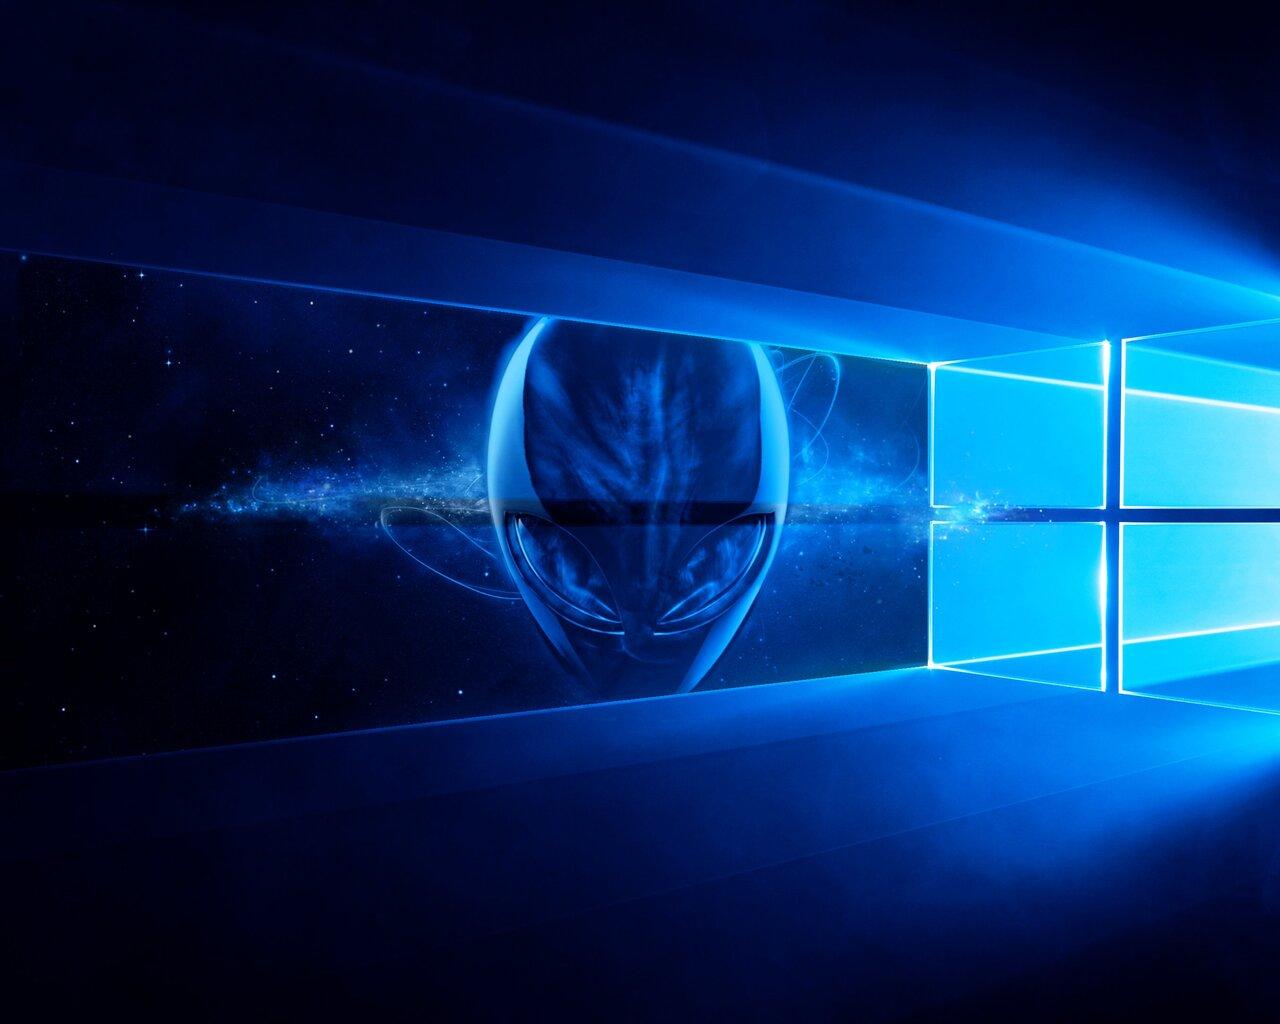 windows wallpaper 3440x1440: 1280x1024 Alienware Windows 10 1280x1024 Resolution HD 4k